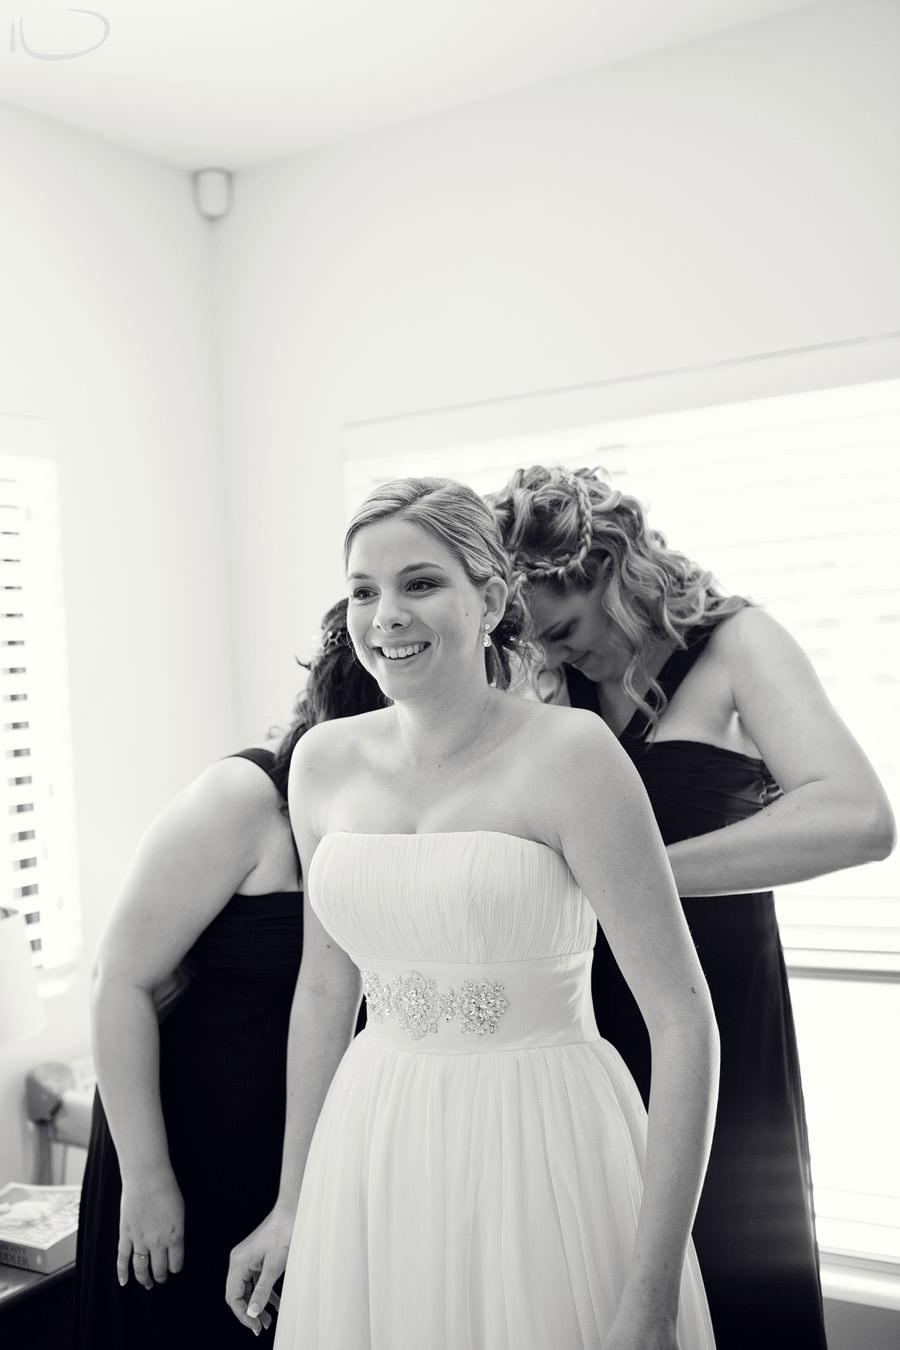 Cronulla Wedding Photographer: Bride getting dressed